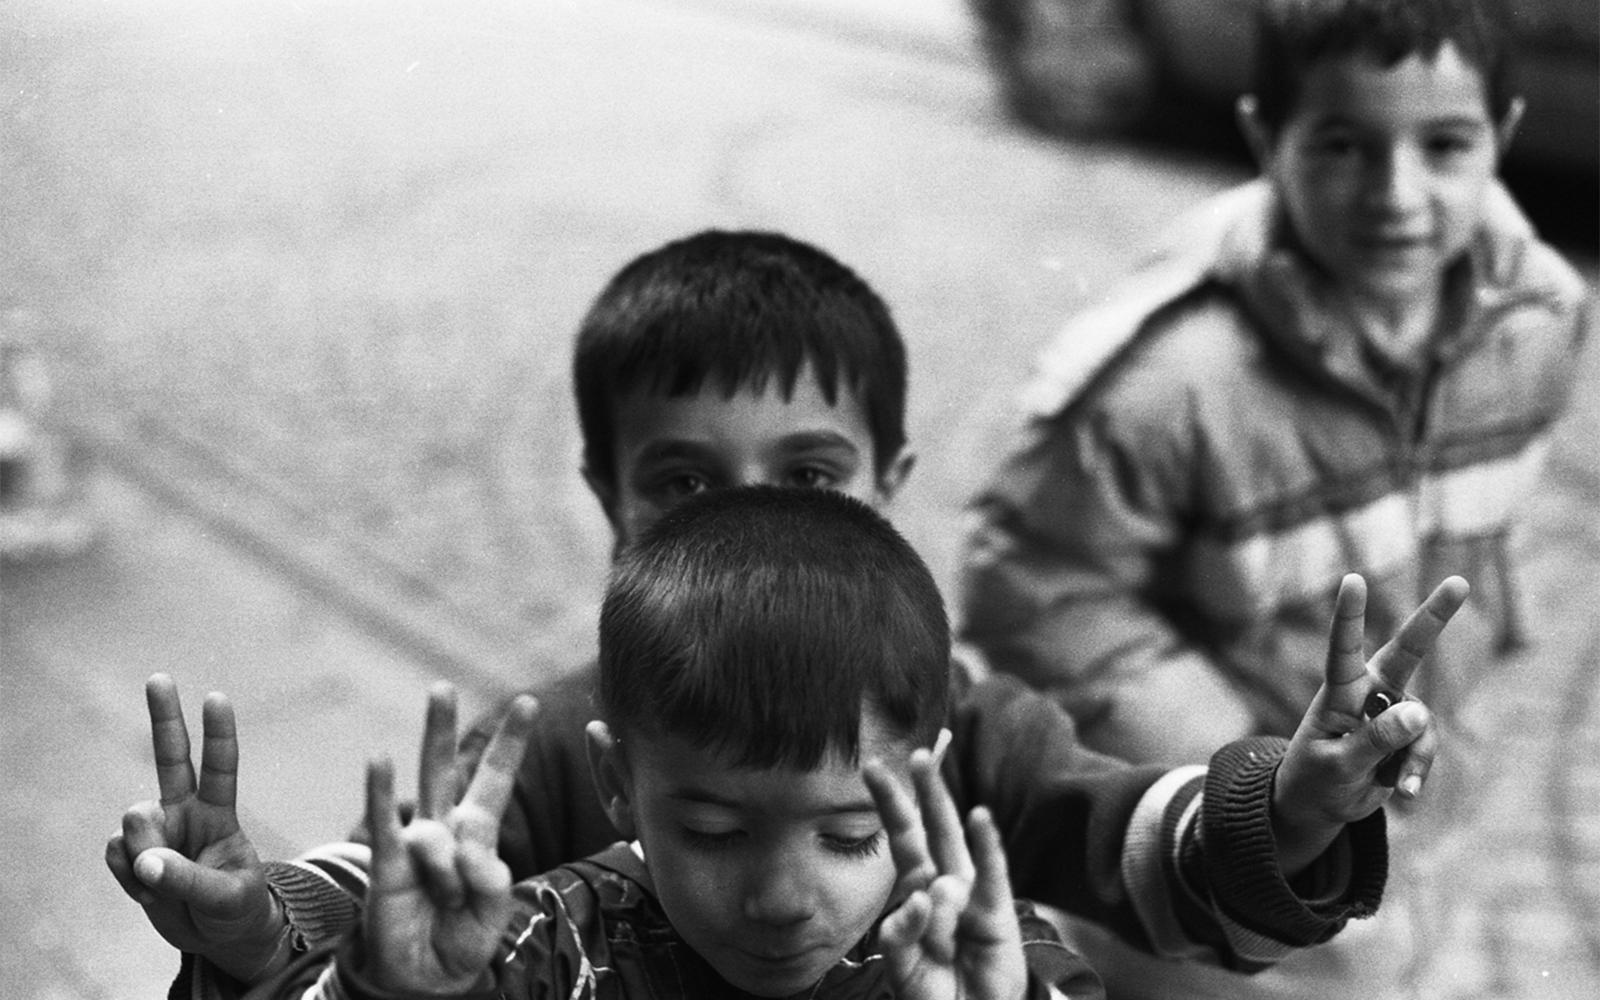 Art and Documentary Photography - Loading D8R2-12-A.jpg